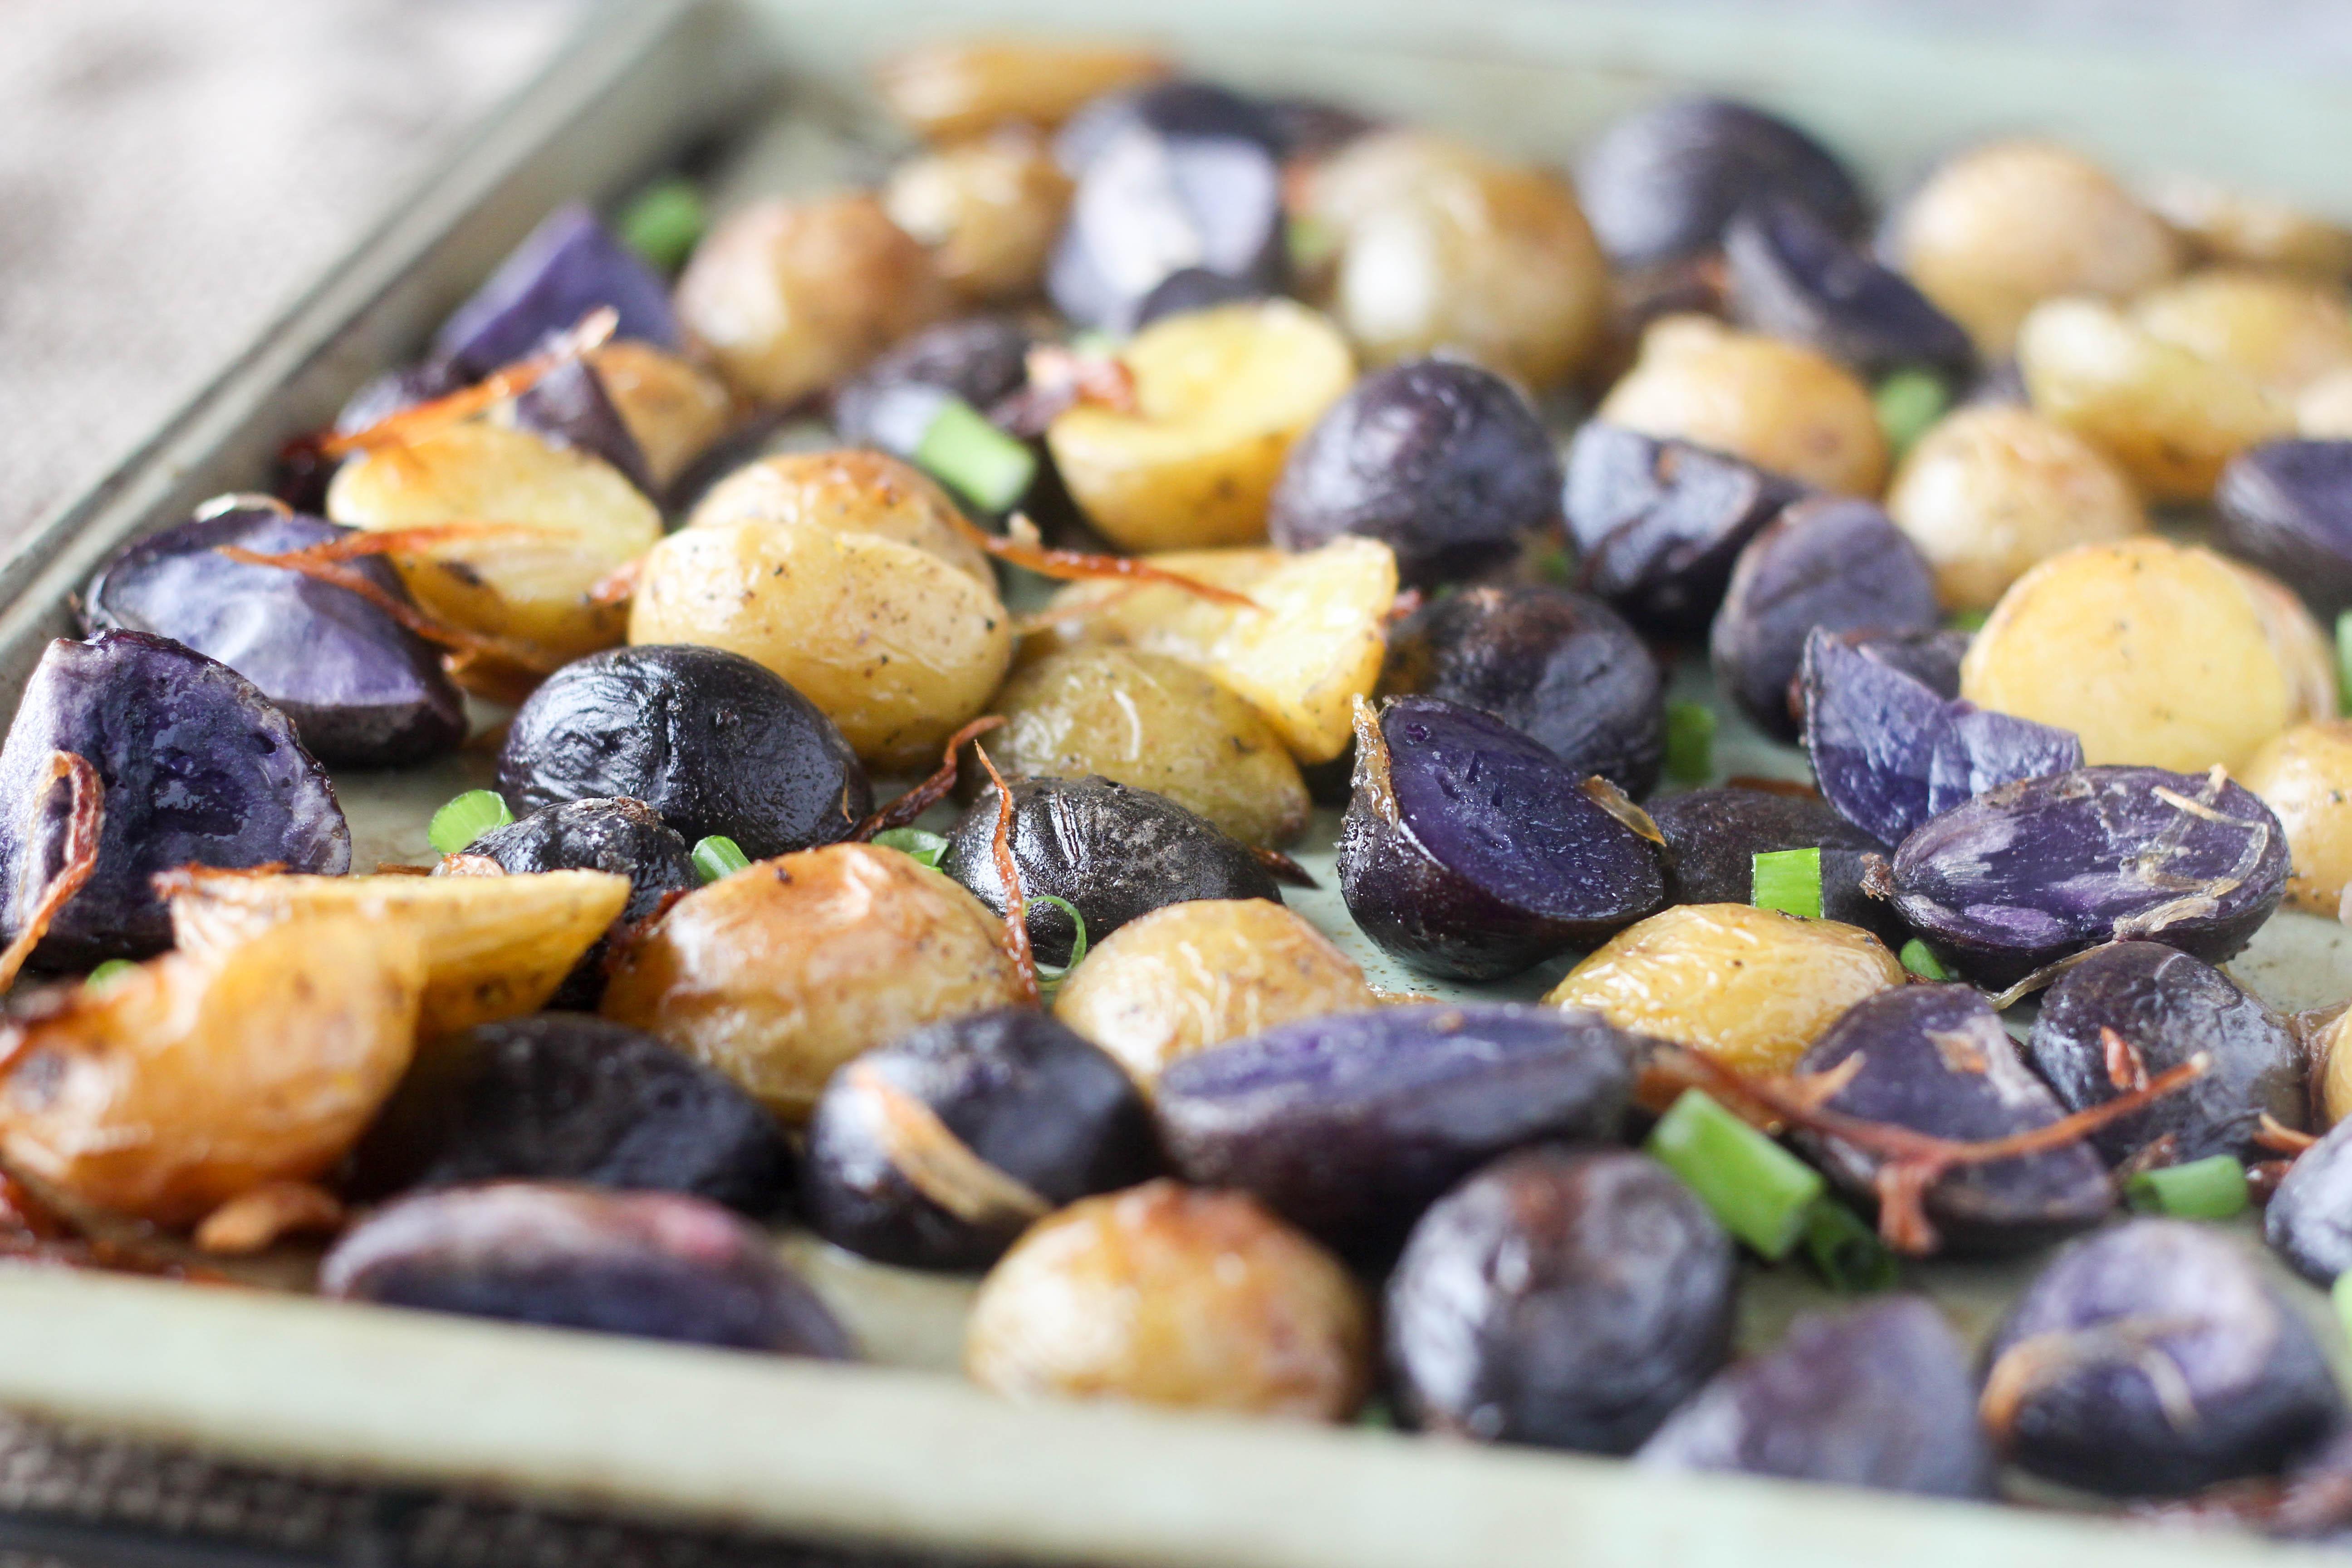 Purple Potato Recipe  Roasted Purple Potatoes with Shallots and Chives Crispy